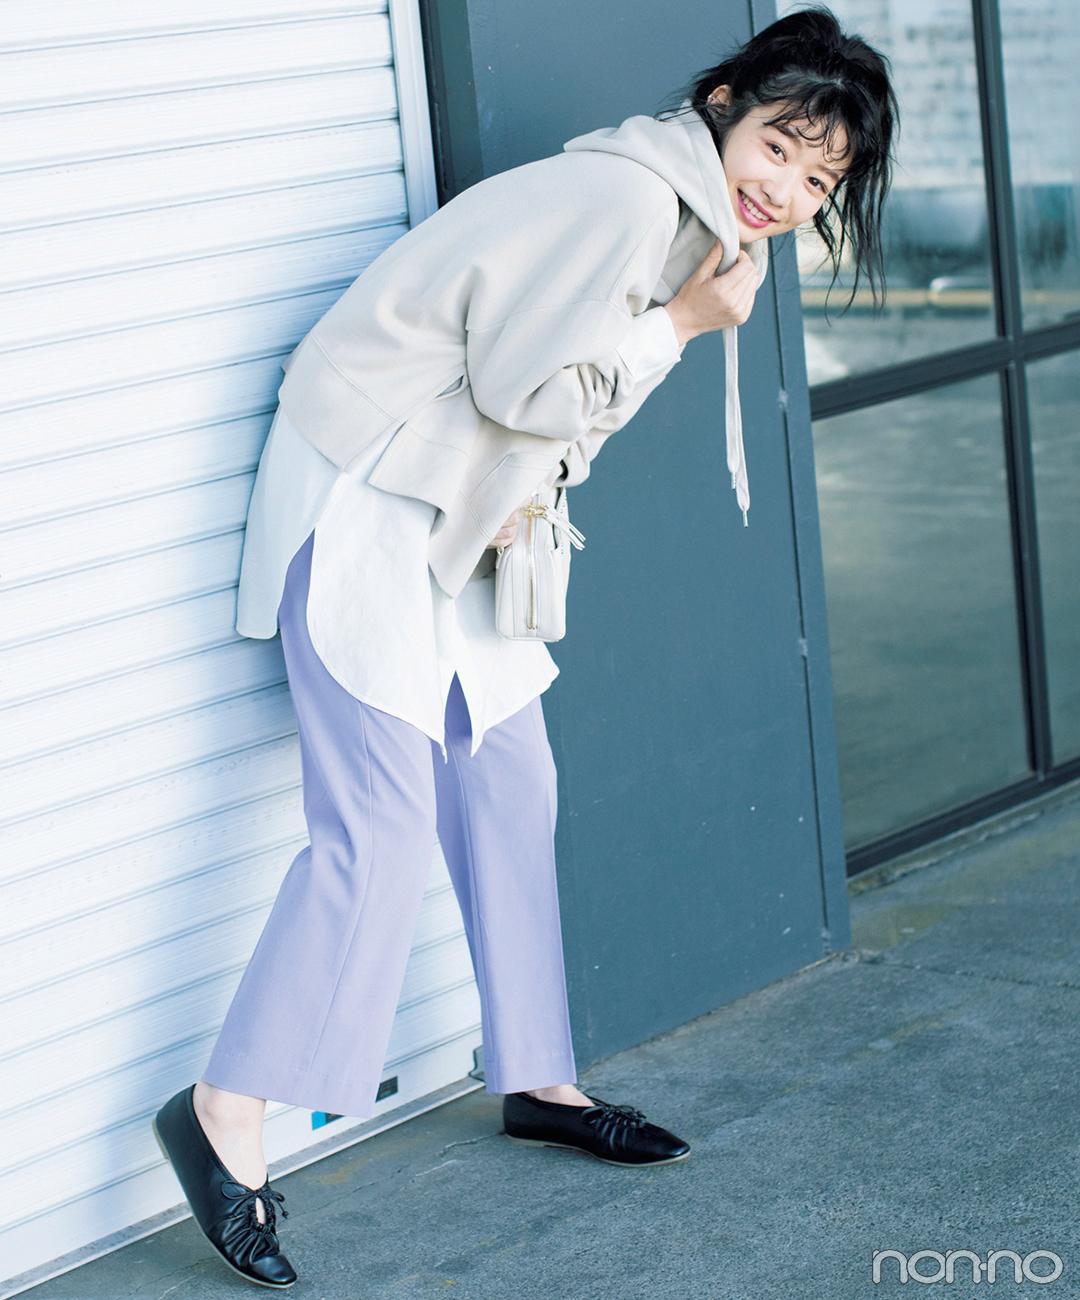 Photo Gallery|ナチュラルな可愛さにきゅん♡ 岡本夏美フォトギャラリー_1_15